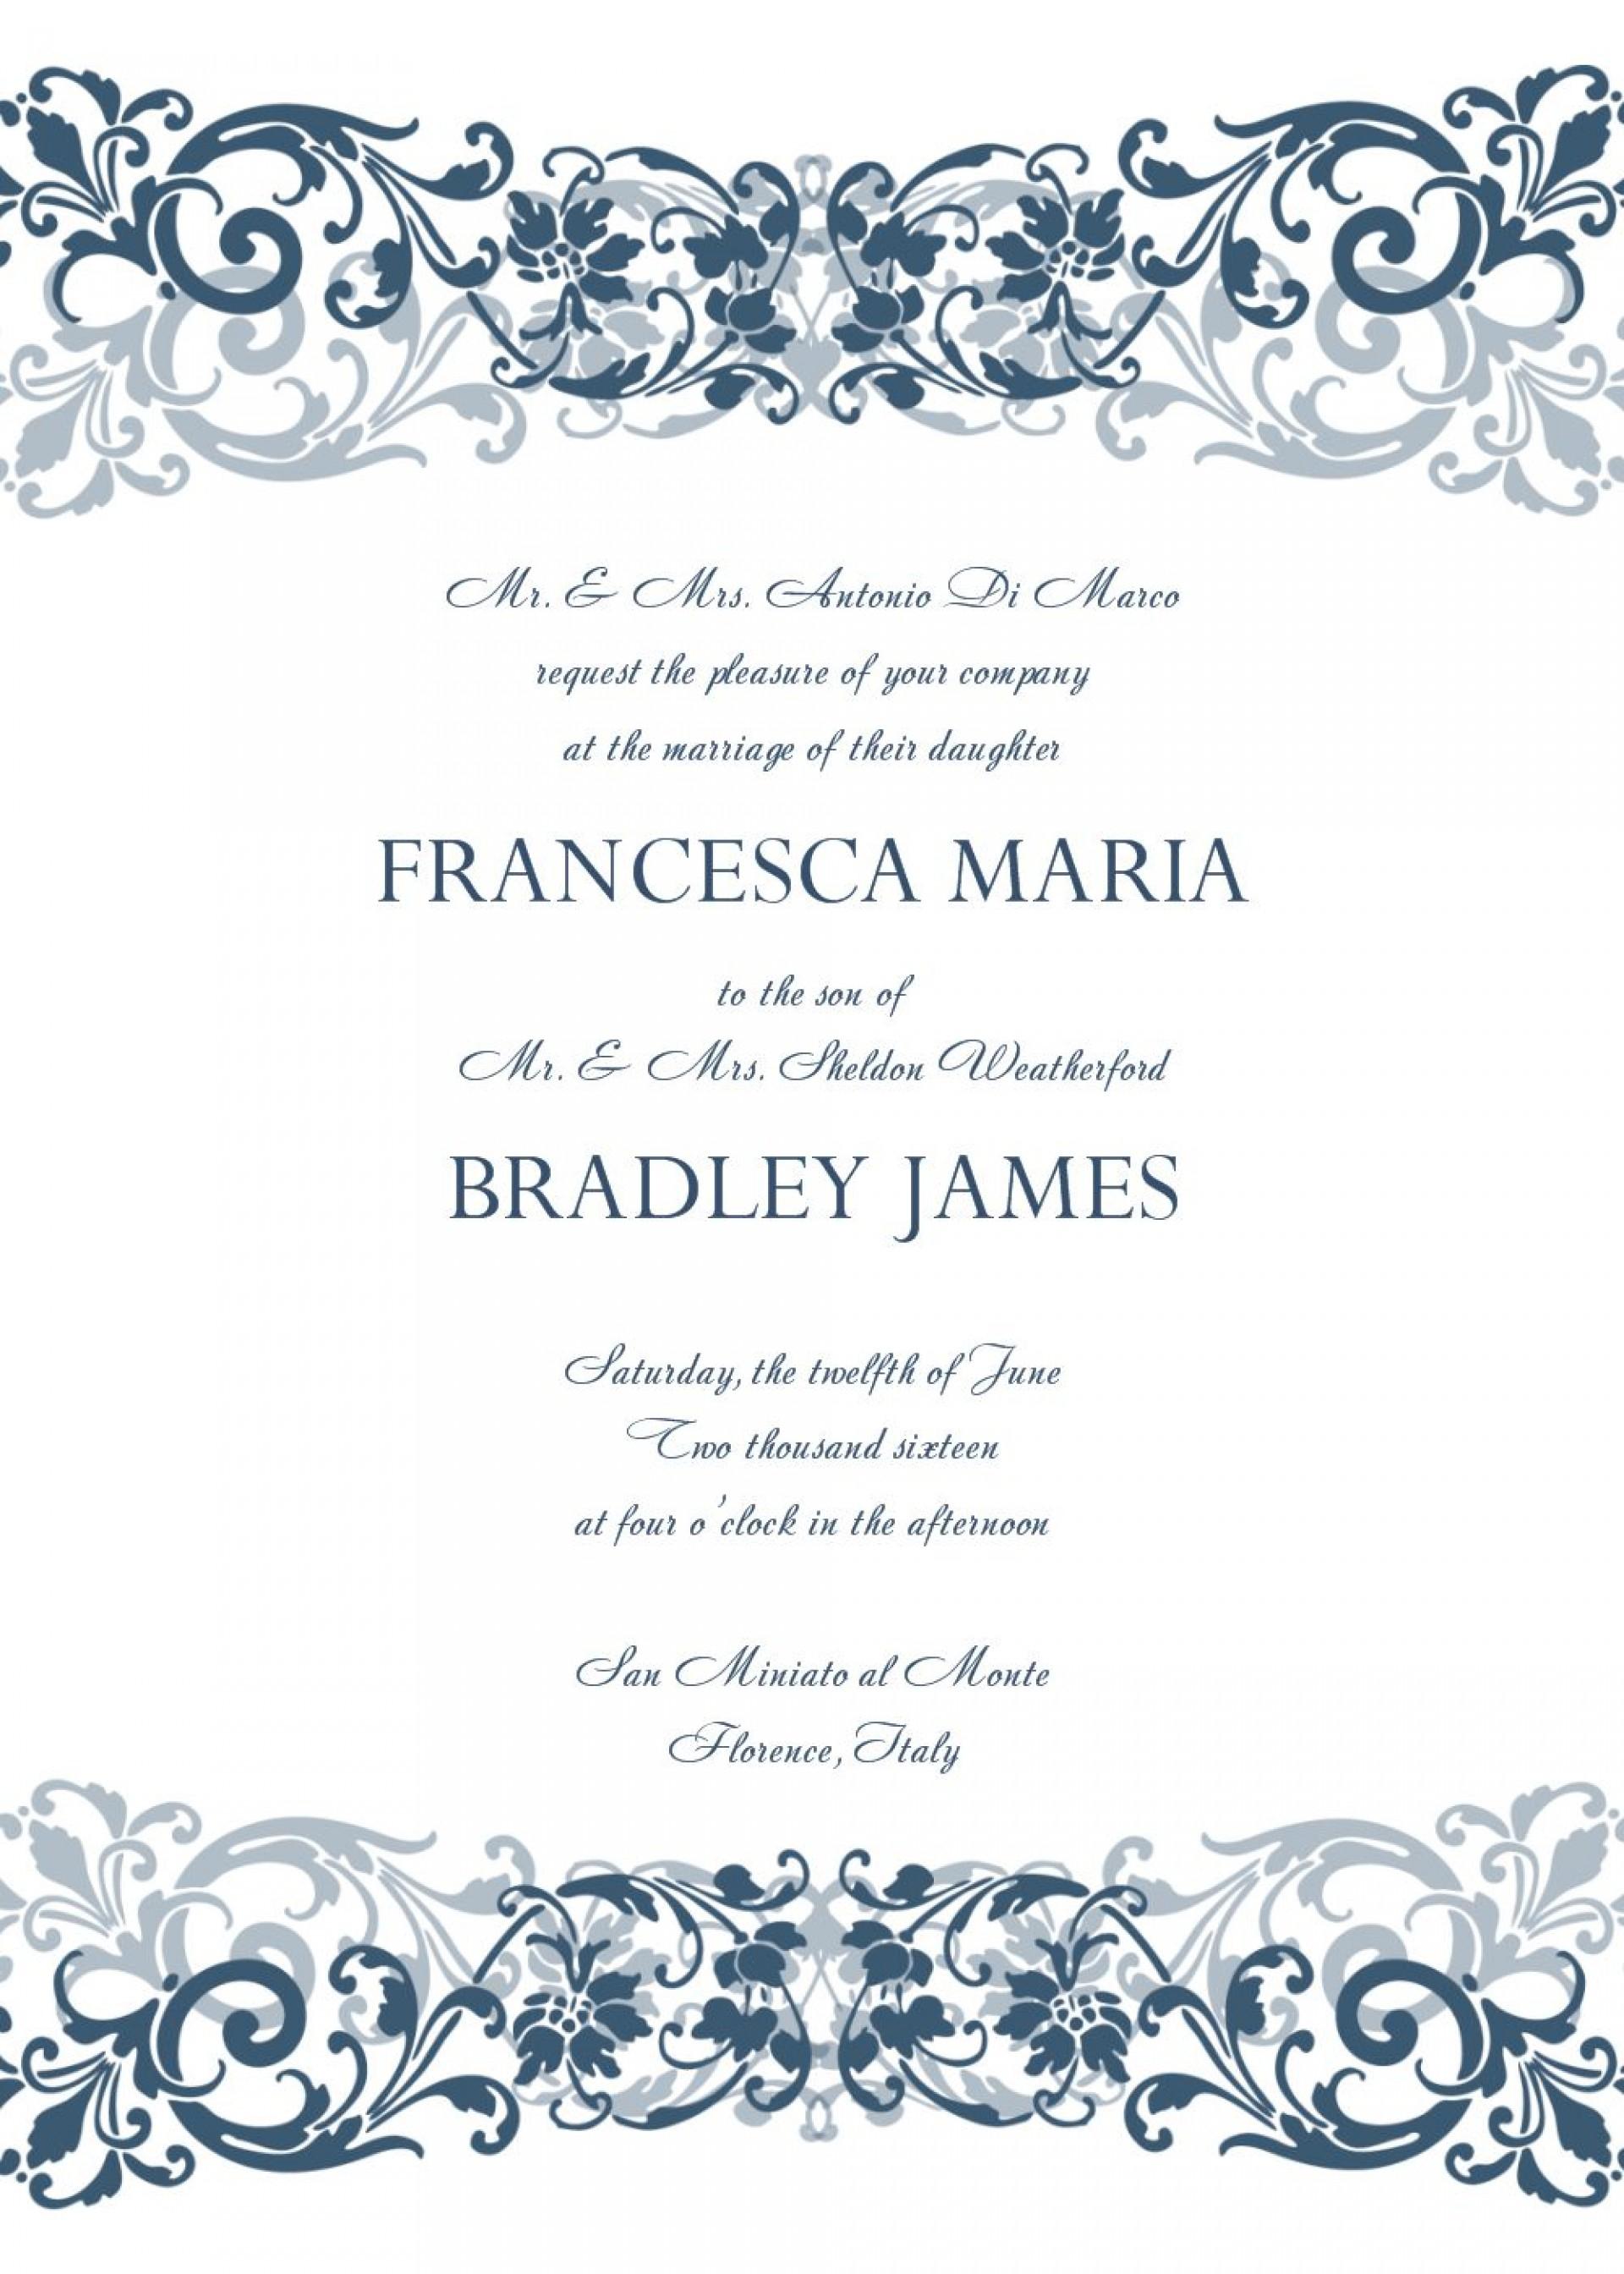 Creating Personalitations Using Microsoft Word Choosingitation - Free Printable Wedding Invitation Templates For Microsoft Word